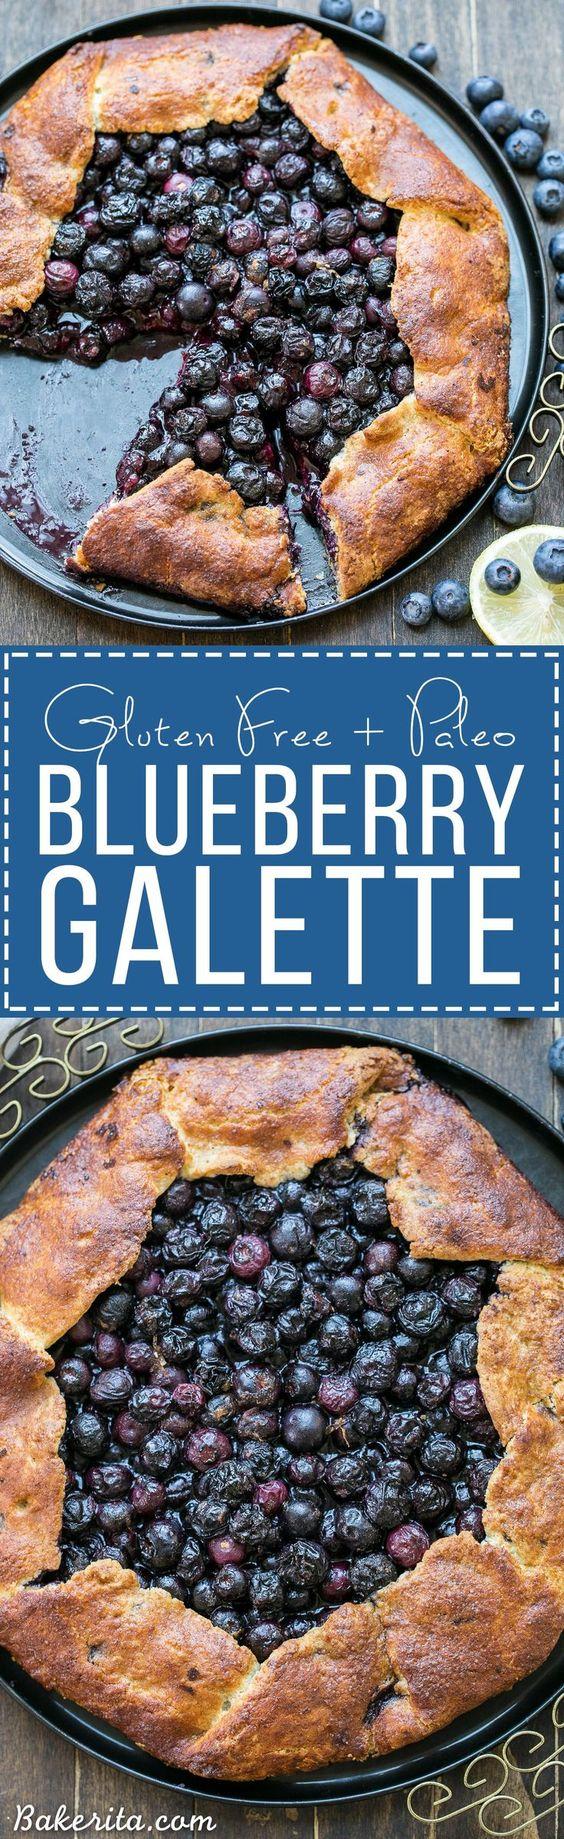 blueberry-galette-paleo-vegan-gluten-free